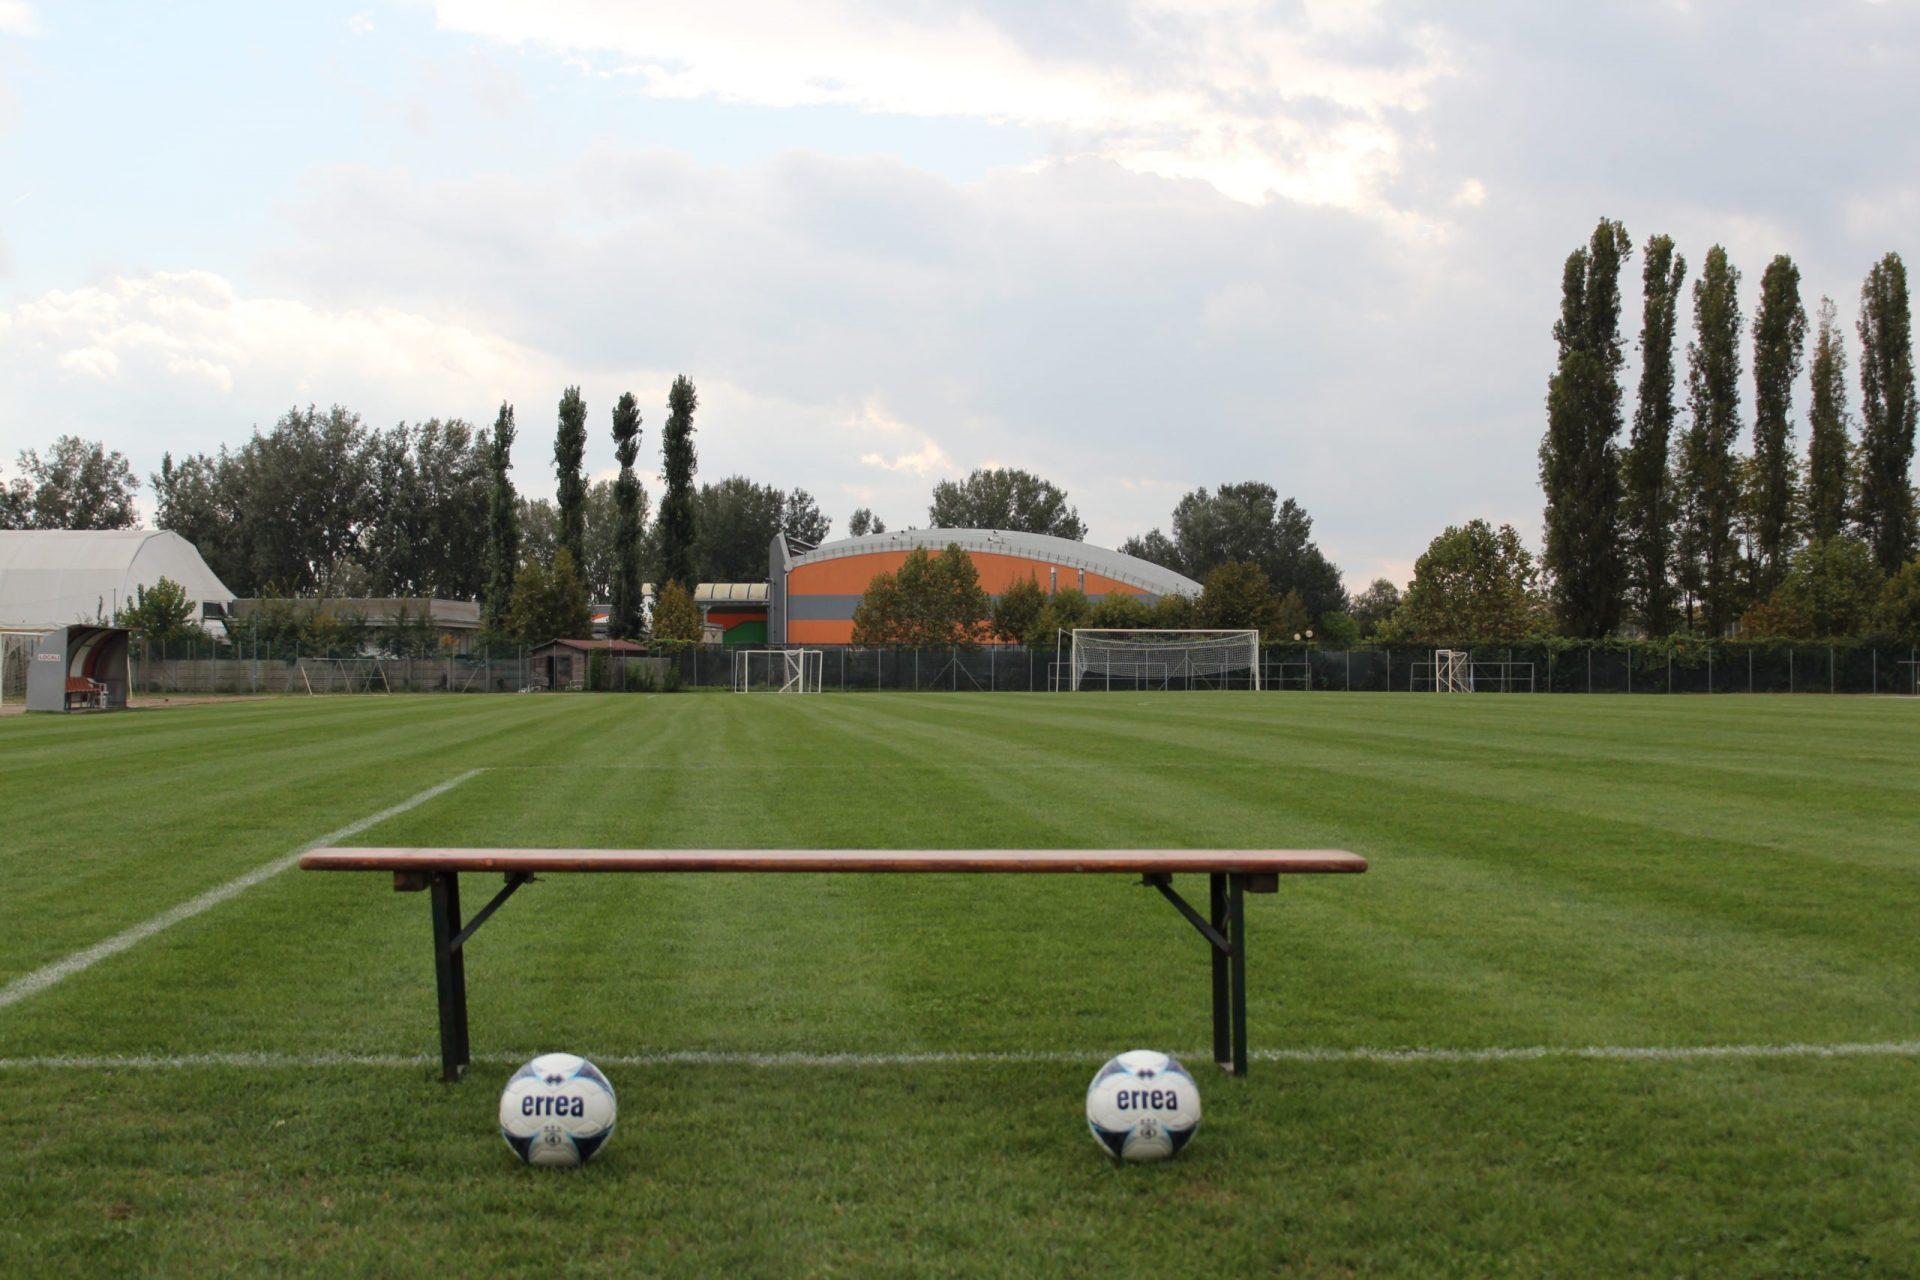 stadio_vallini_piove_di_sacco